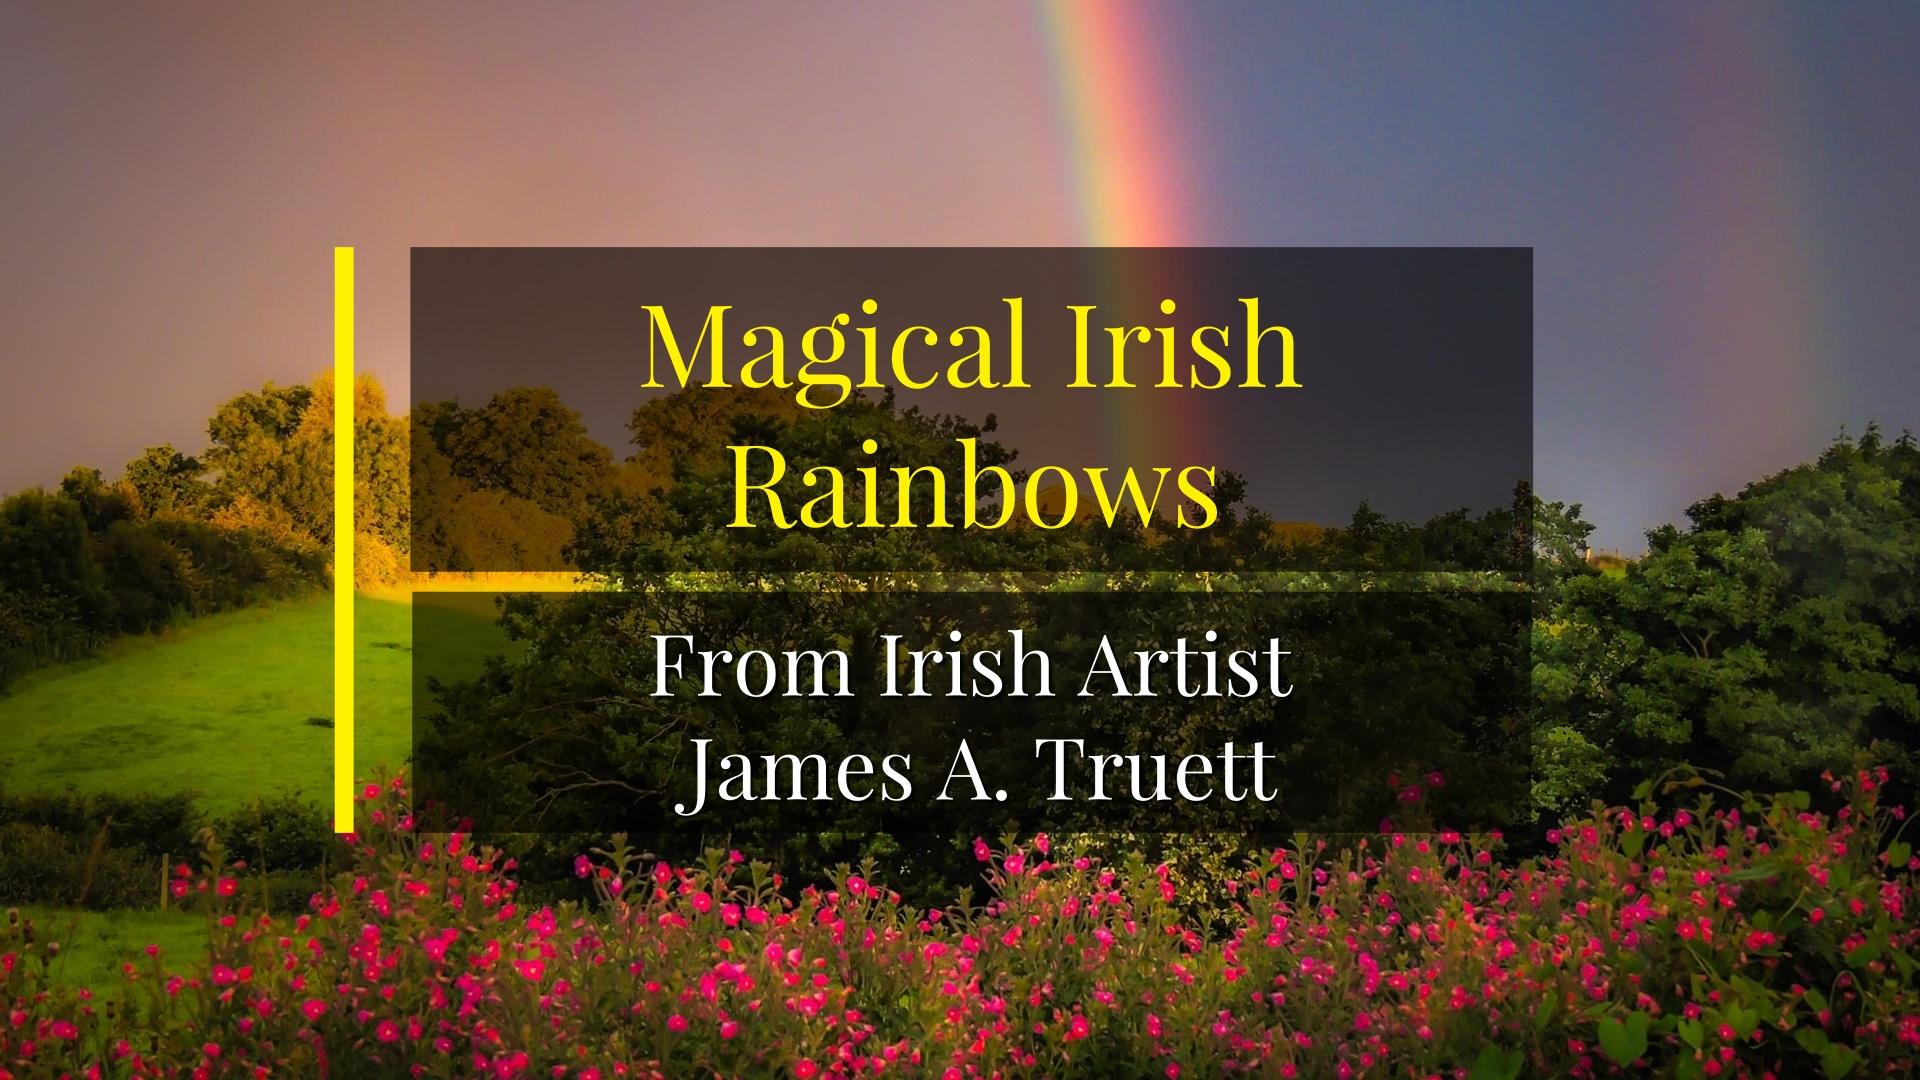 Magical Irish Rainbows